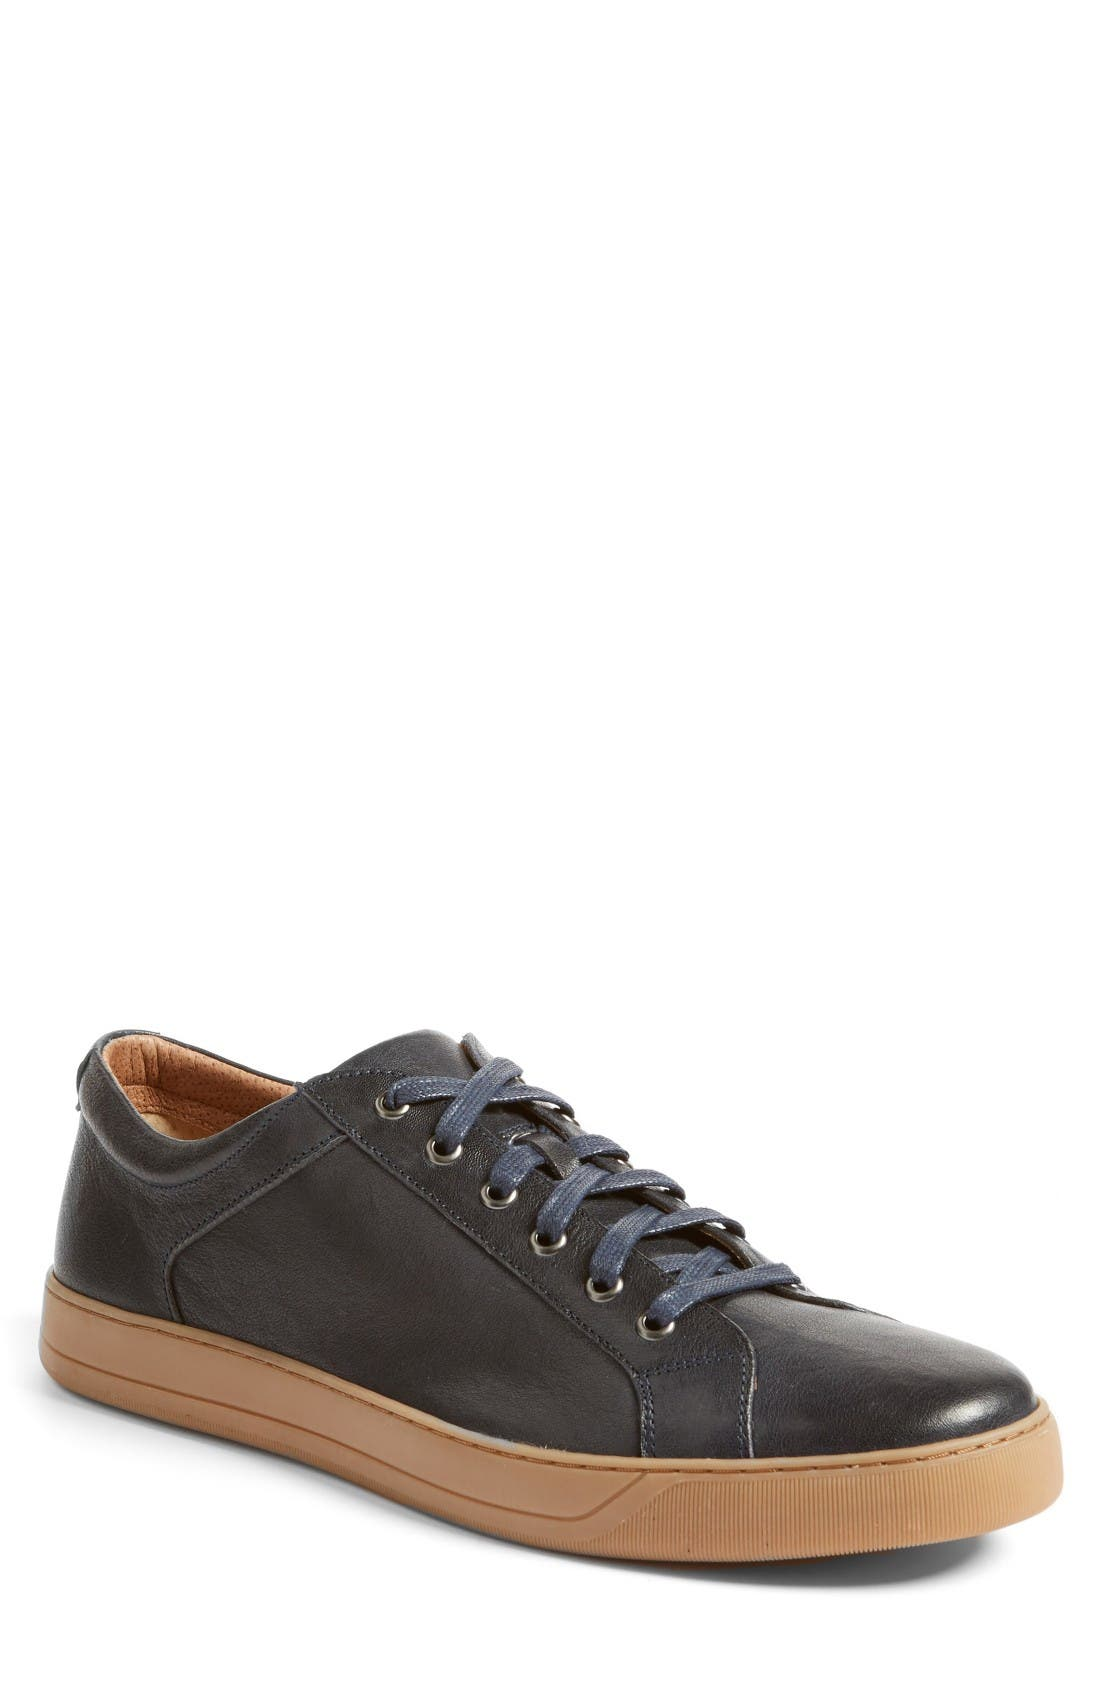 J&M 1850 Allister Sneaker (Men)